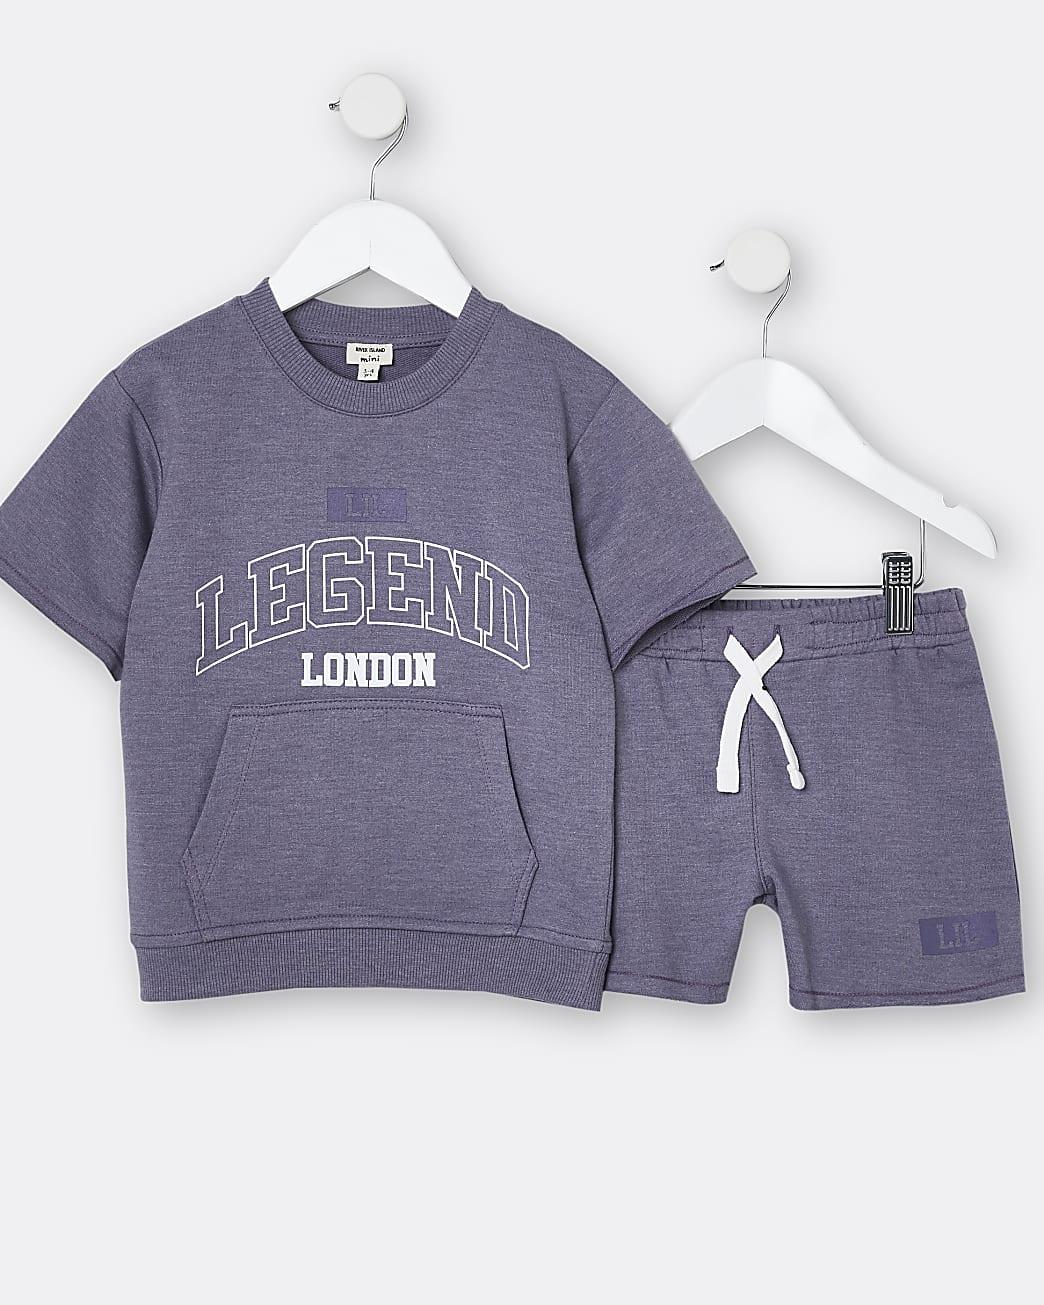 Mini boys purple 'Legend' top and shorts set